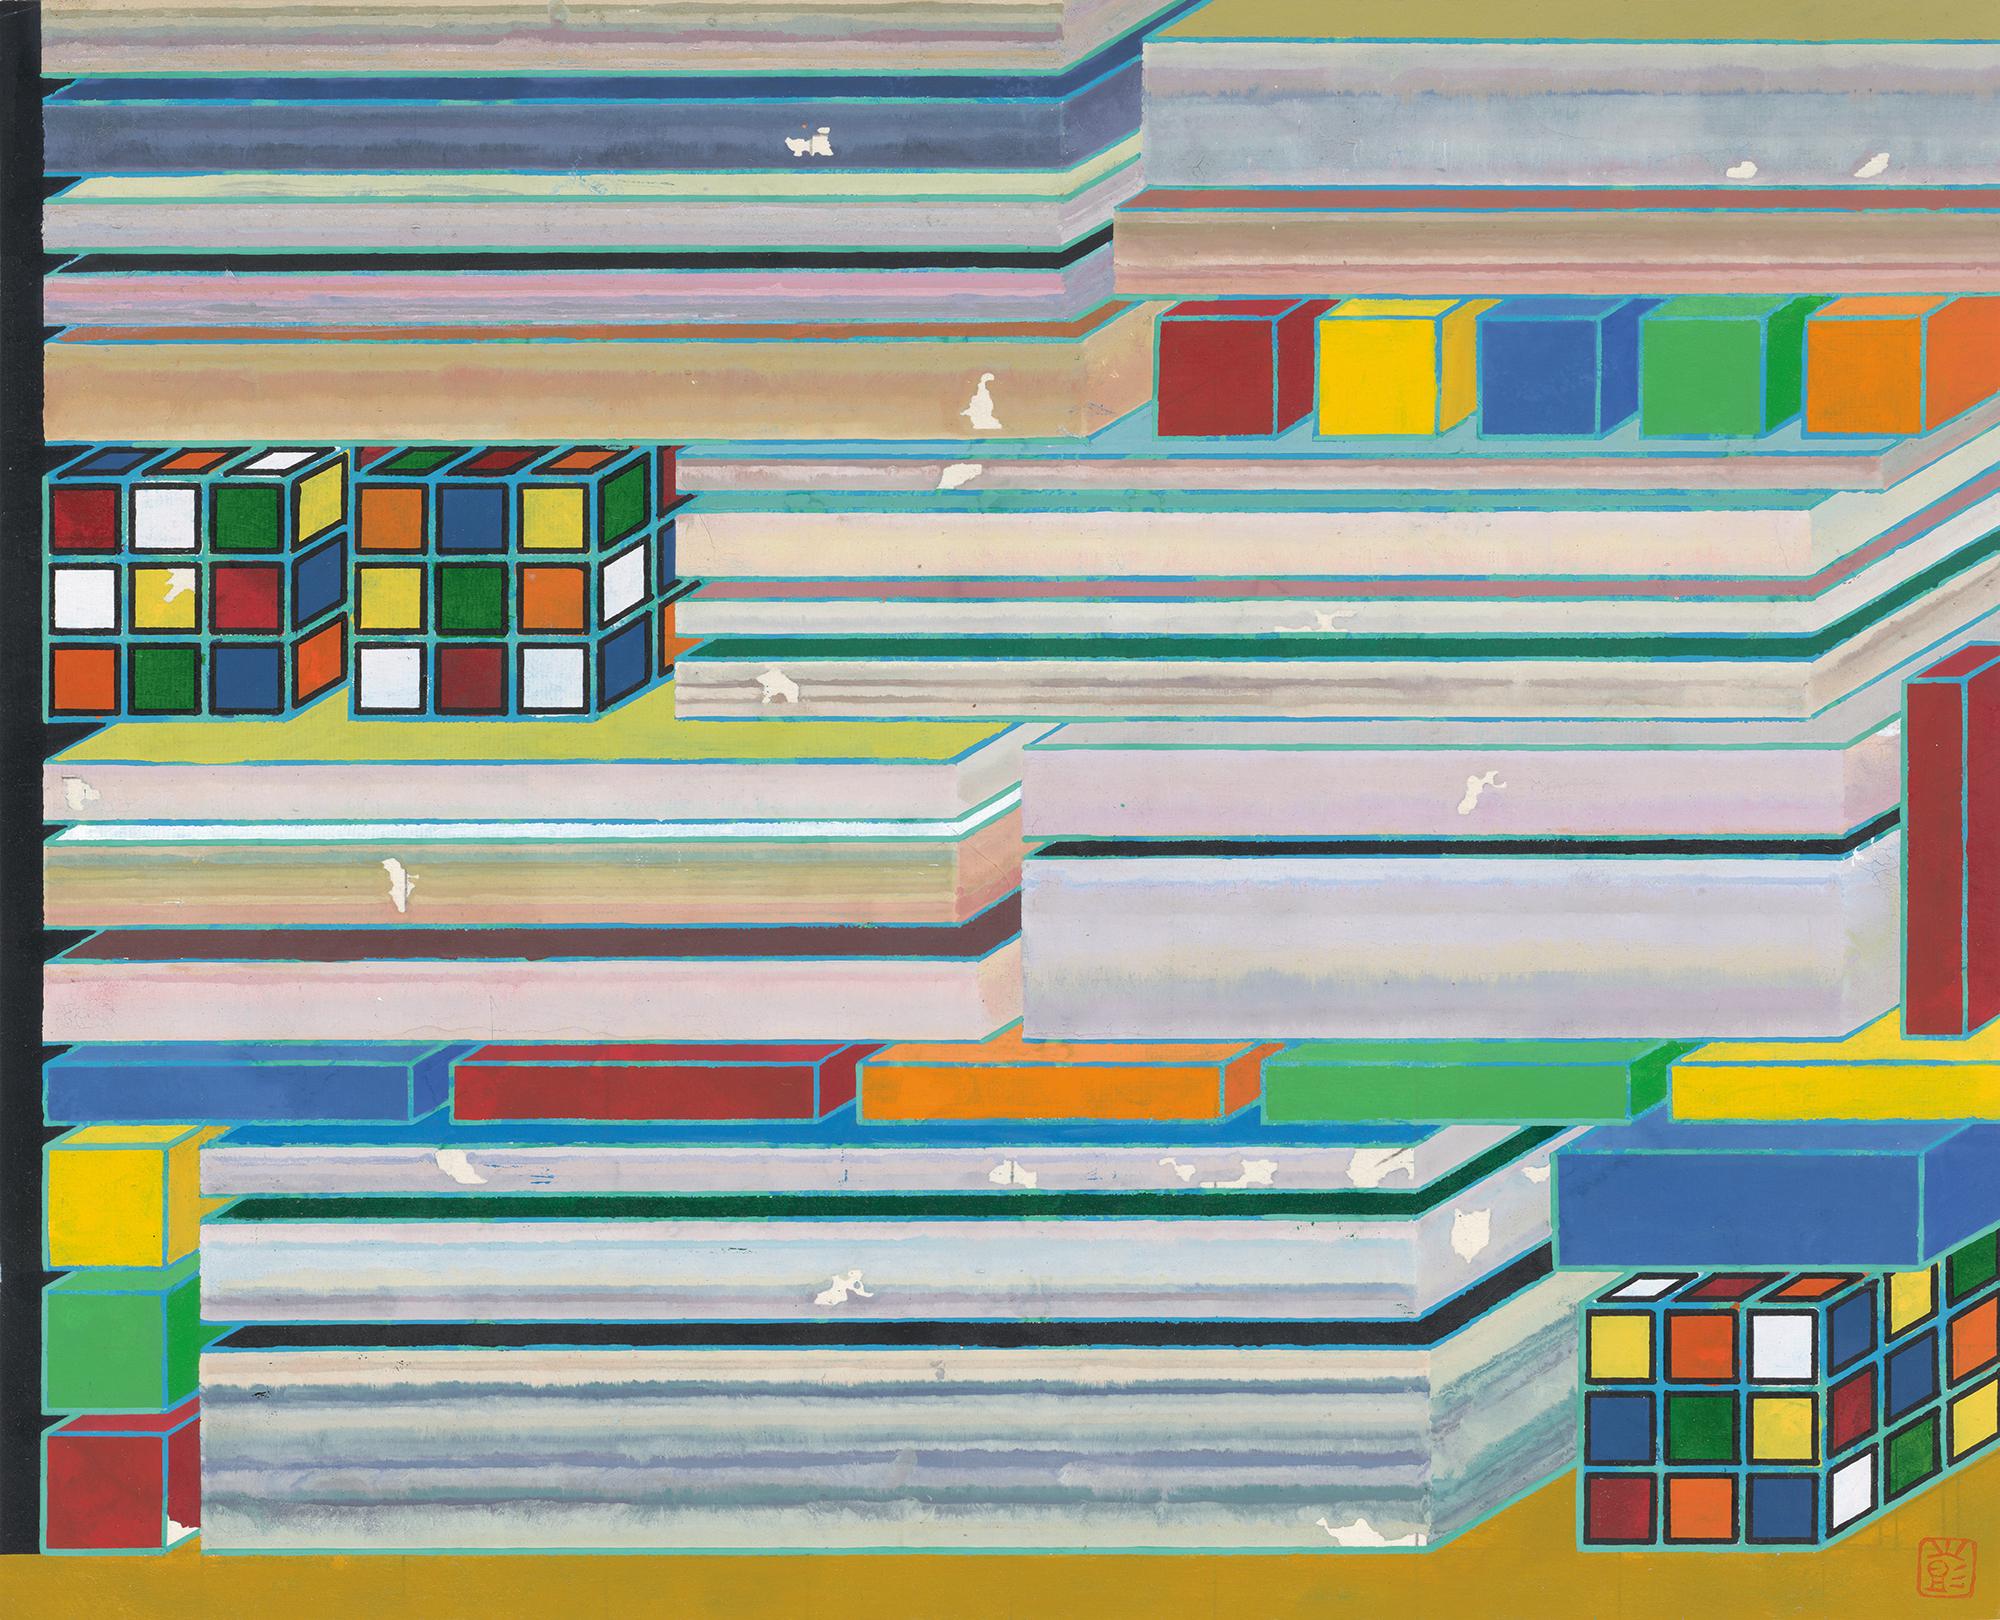 Peng Jian 彭剑, 迷局 No.2, 2015, Ink and color on rice paper 纸本设色, 49 × 40 cm